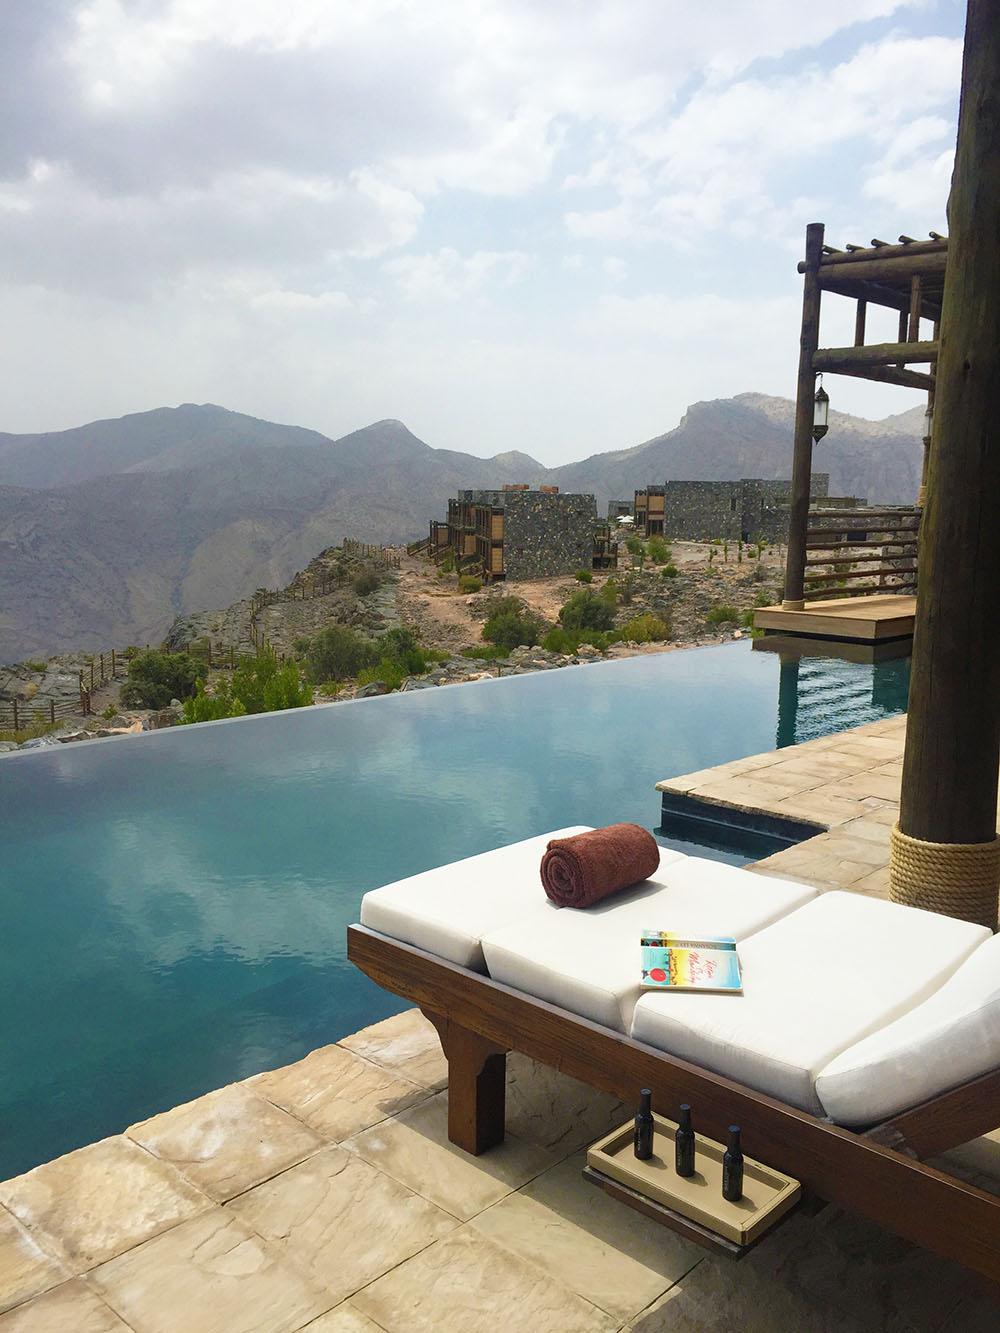 Alila Jebel Akhdar hotel, Oman. Photo Credit: Katie Silcox